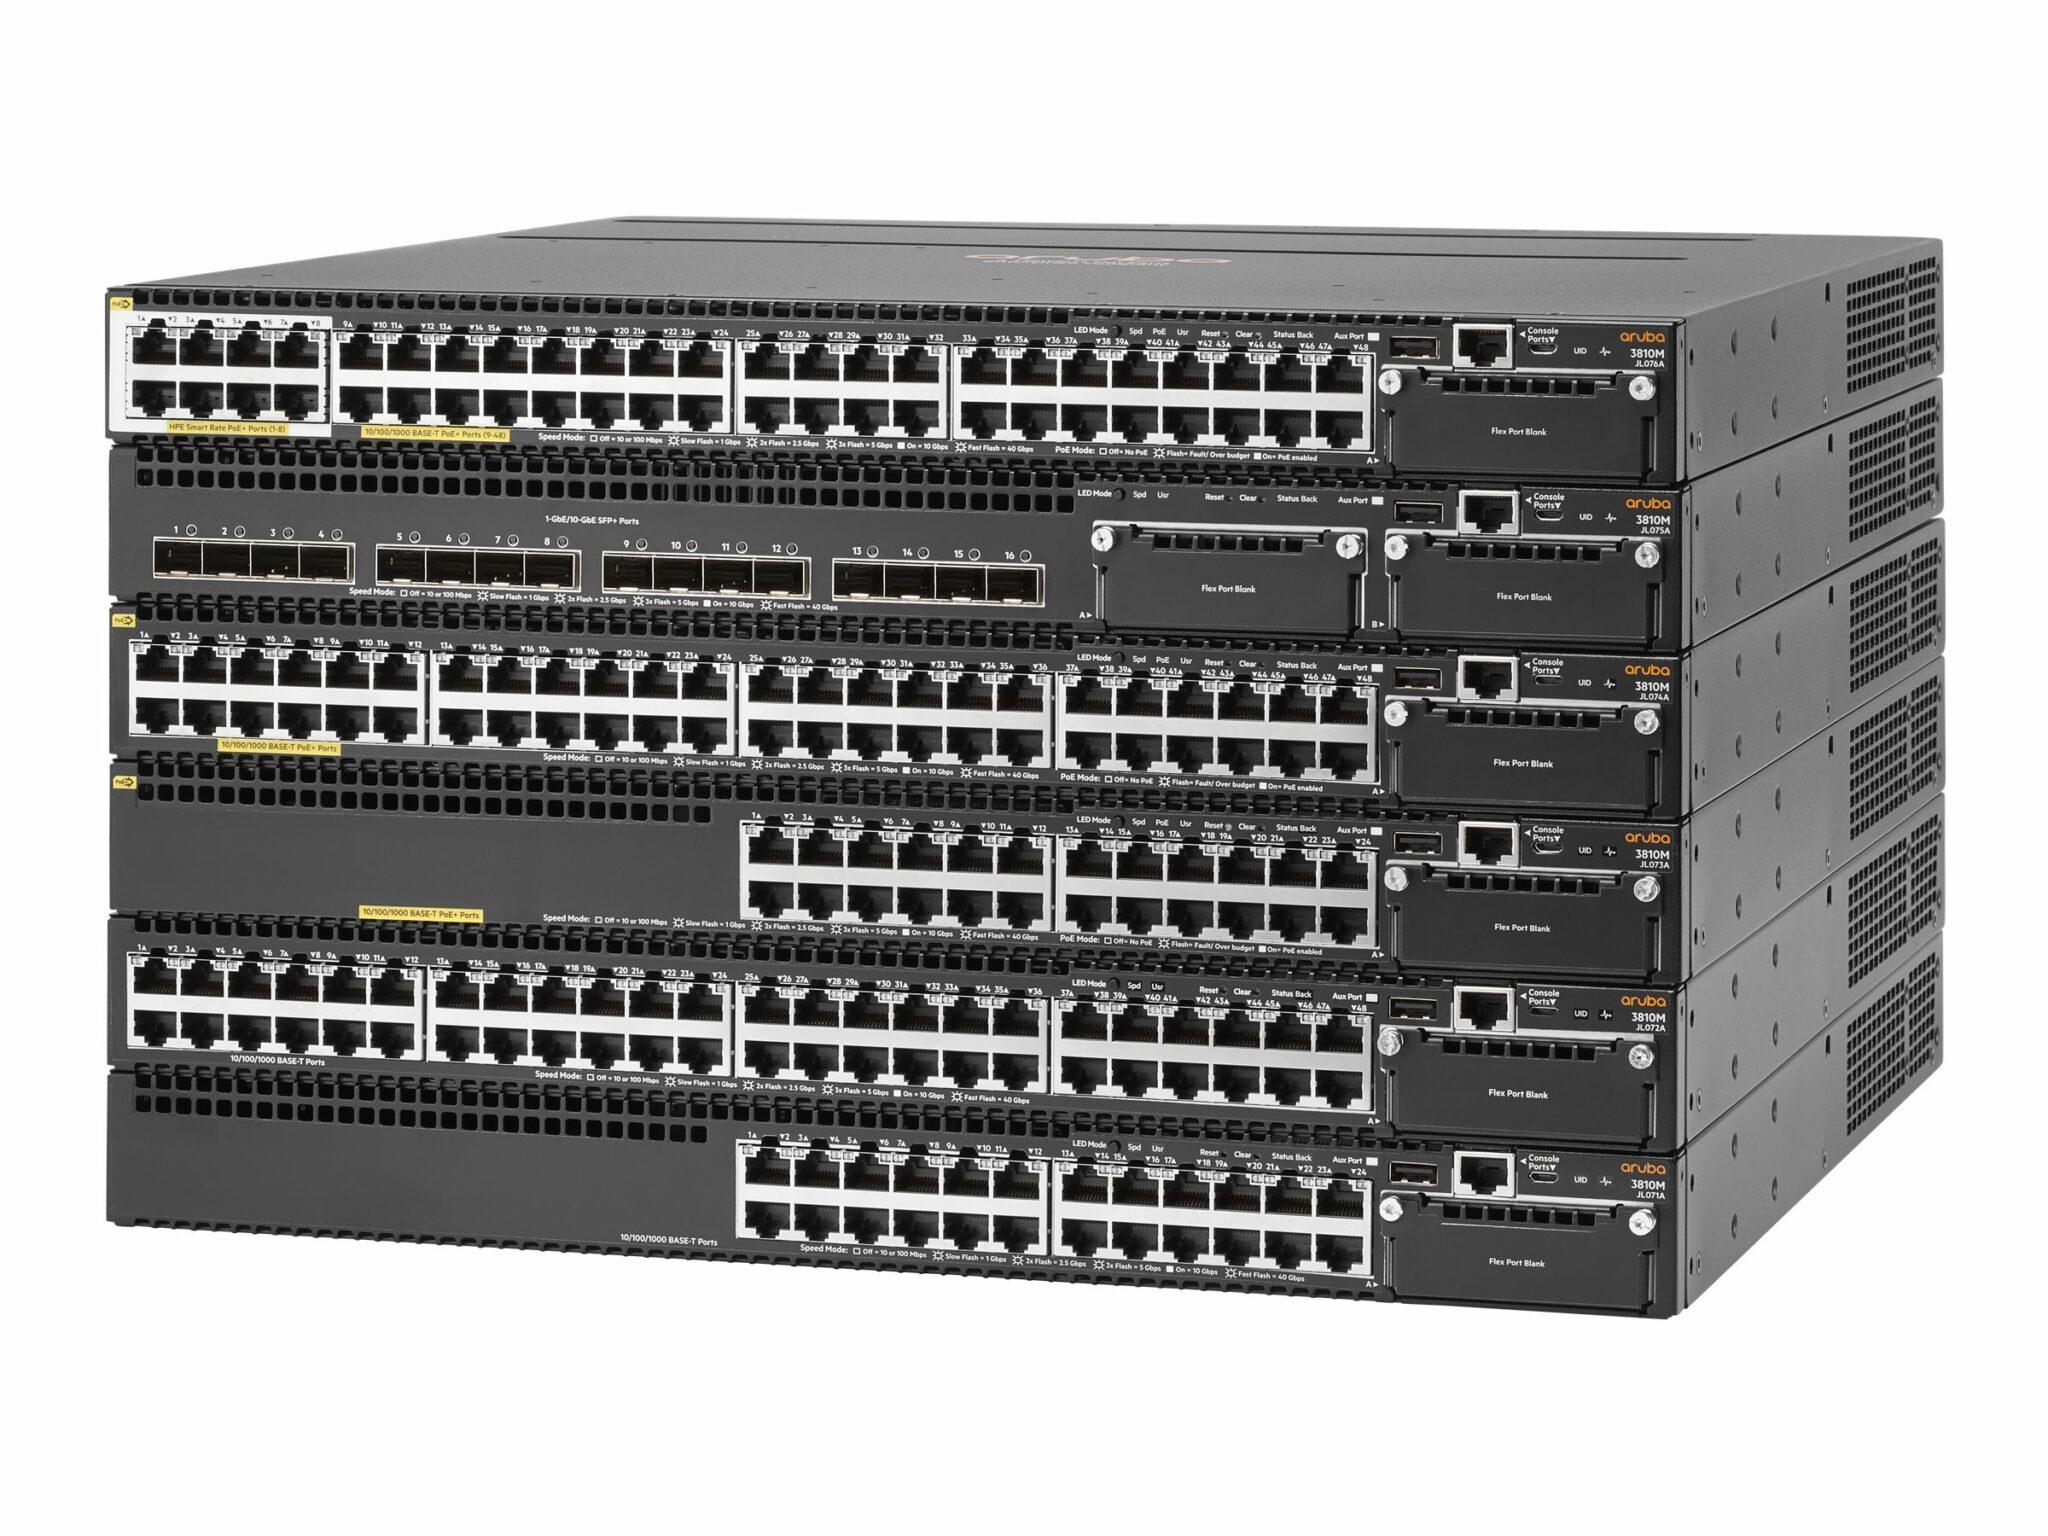 Aruba-3810m-16sfp-2-slot-switch